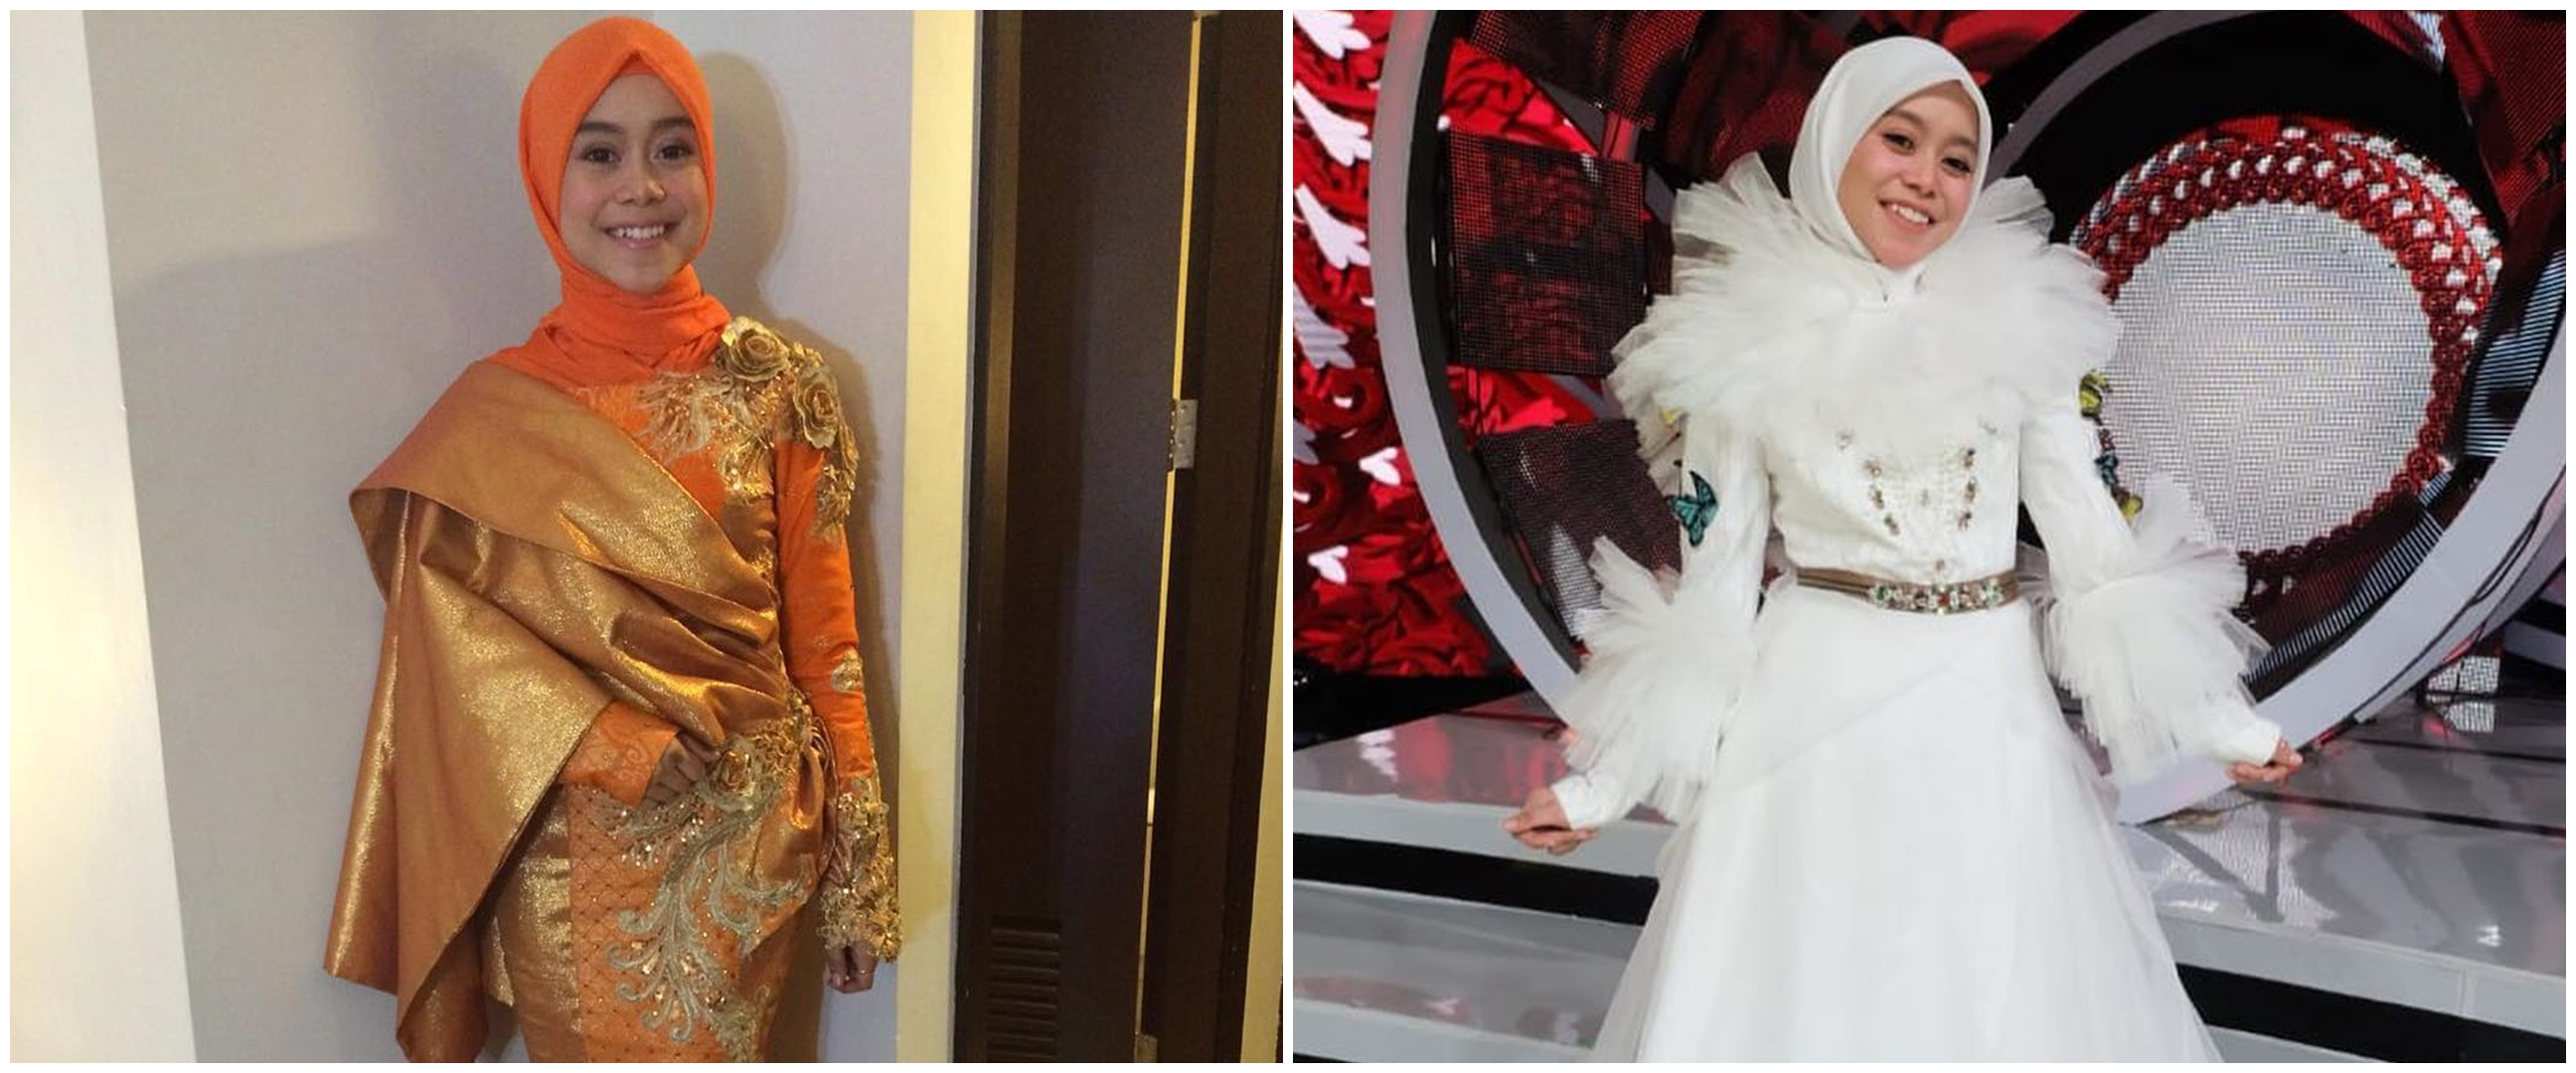 7 Beda penampilan Lesty Kejora dulu saat awal karier & sekarang